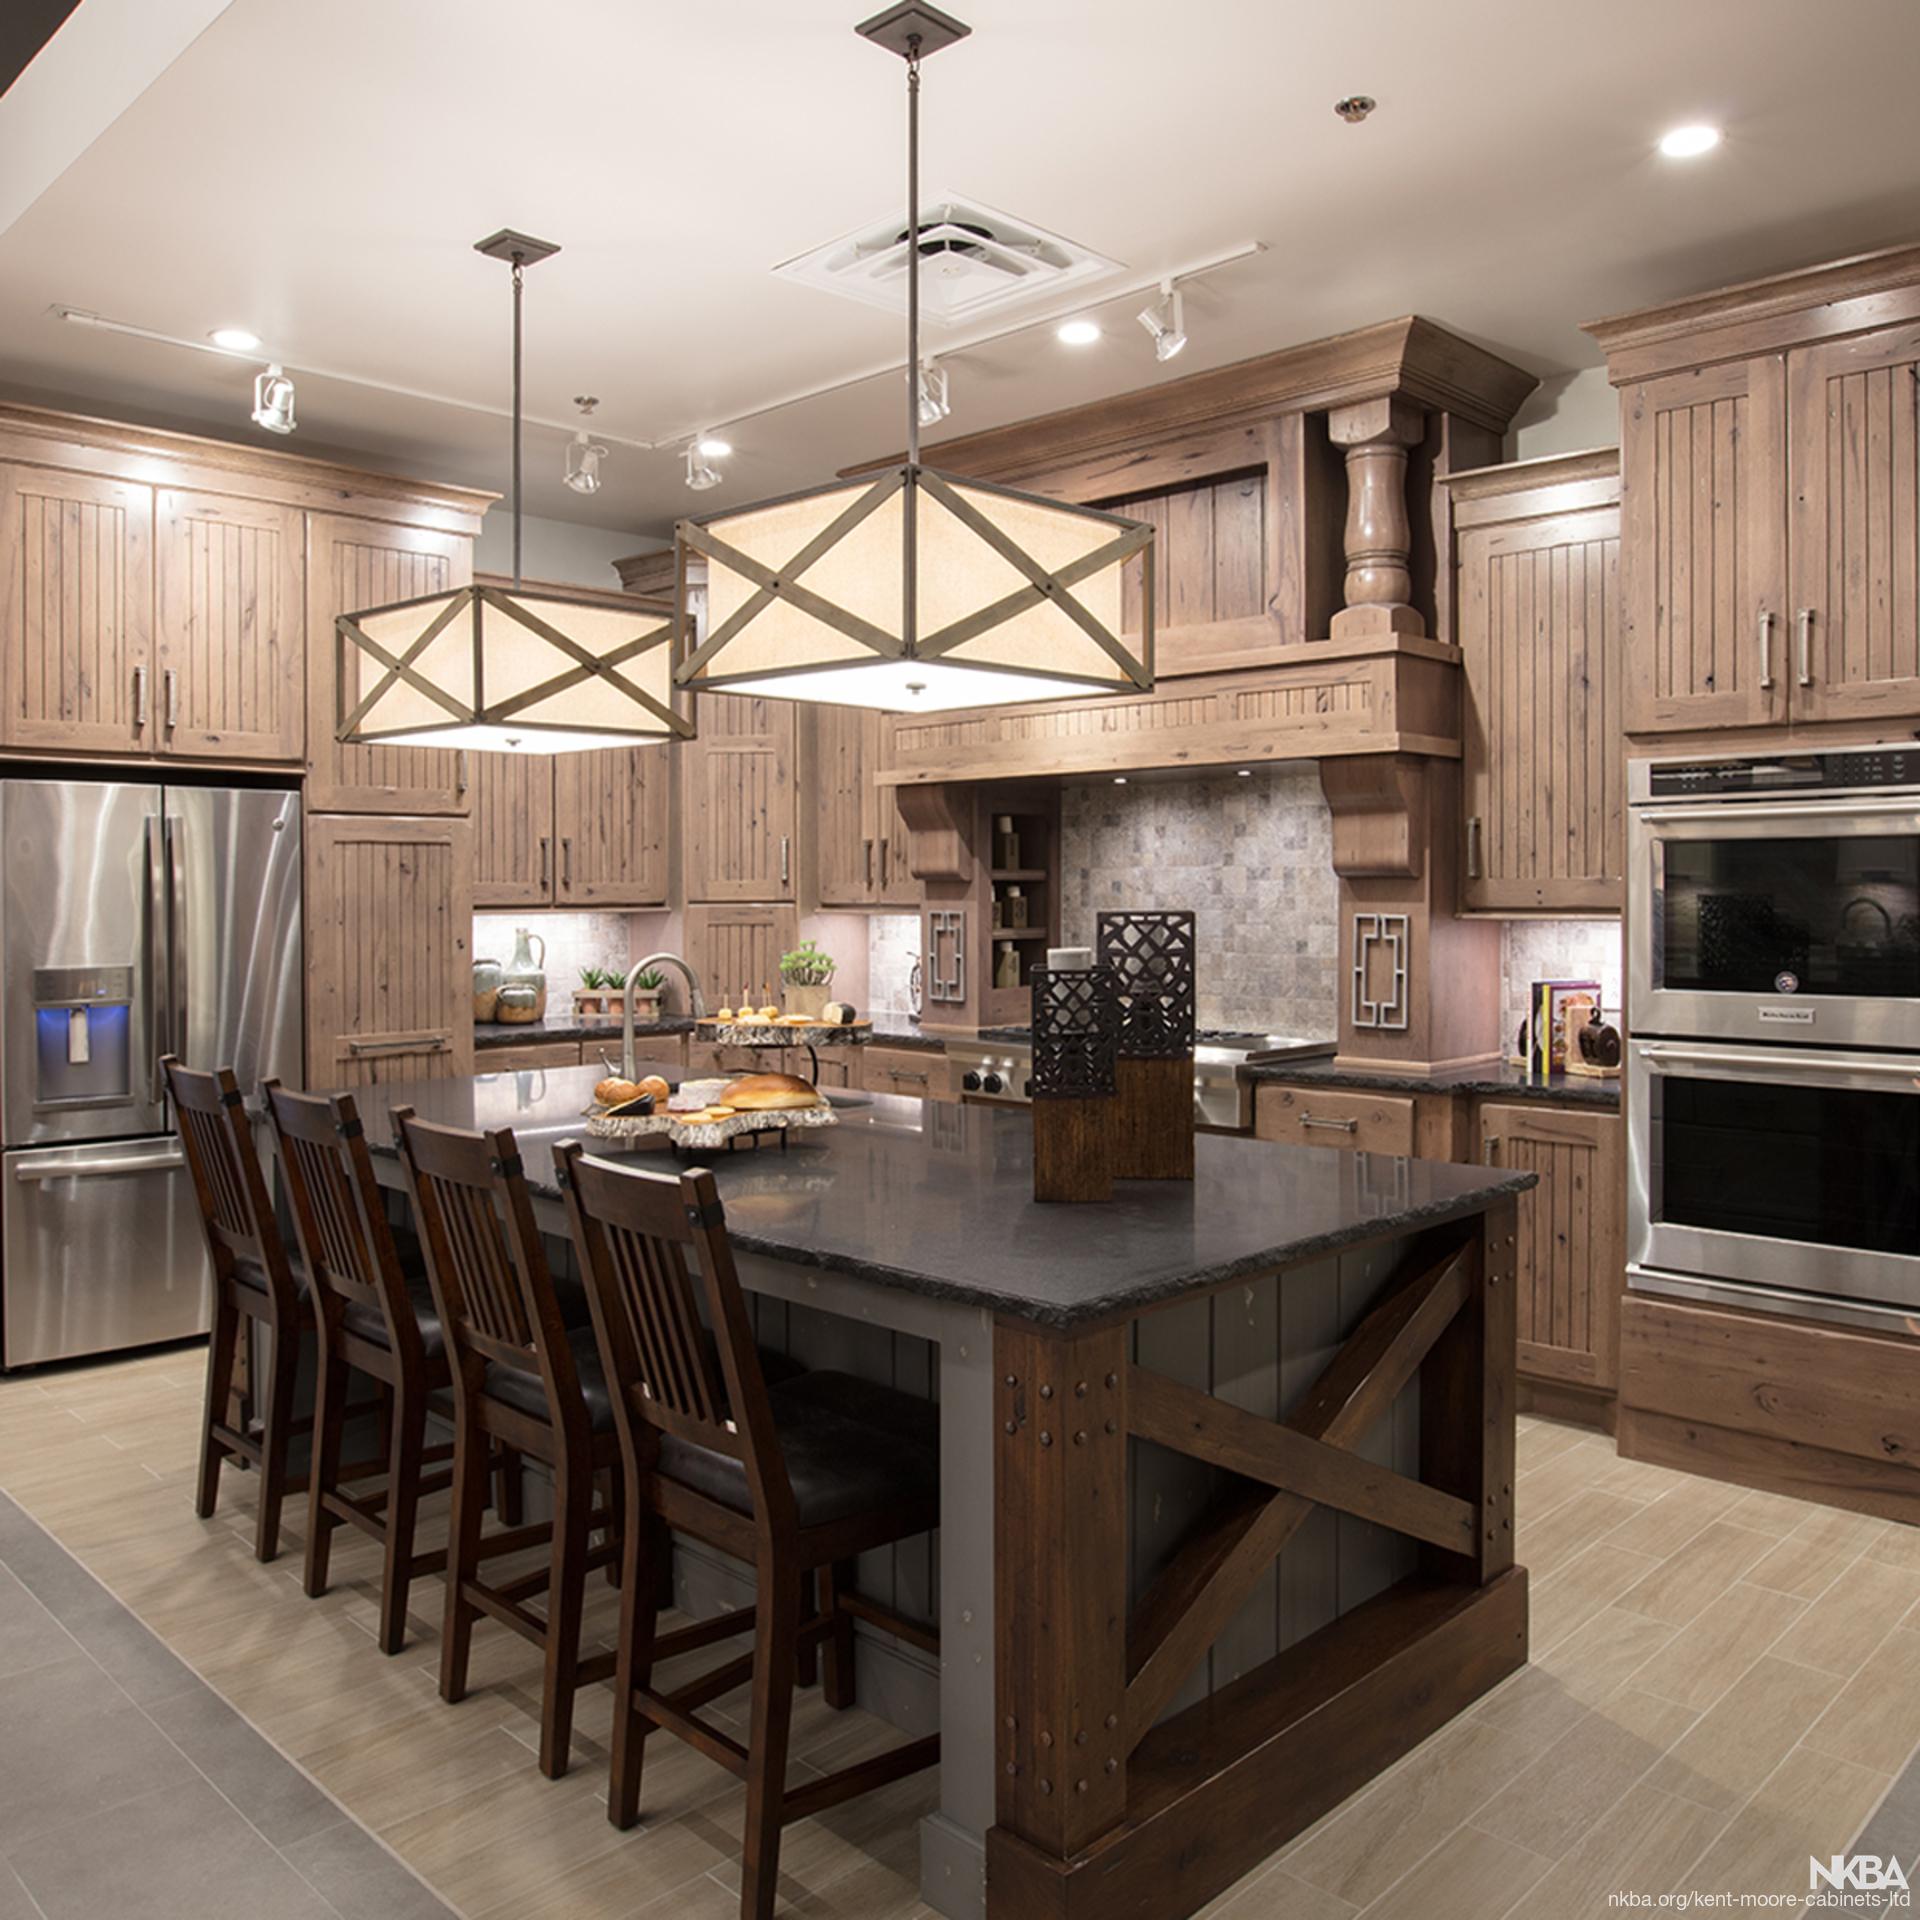 Kitchen Design Kent: Rustic Renaissance Kitchen